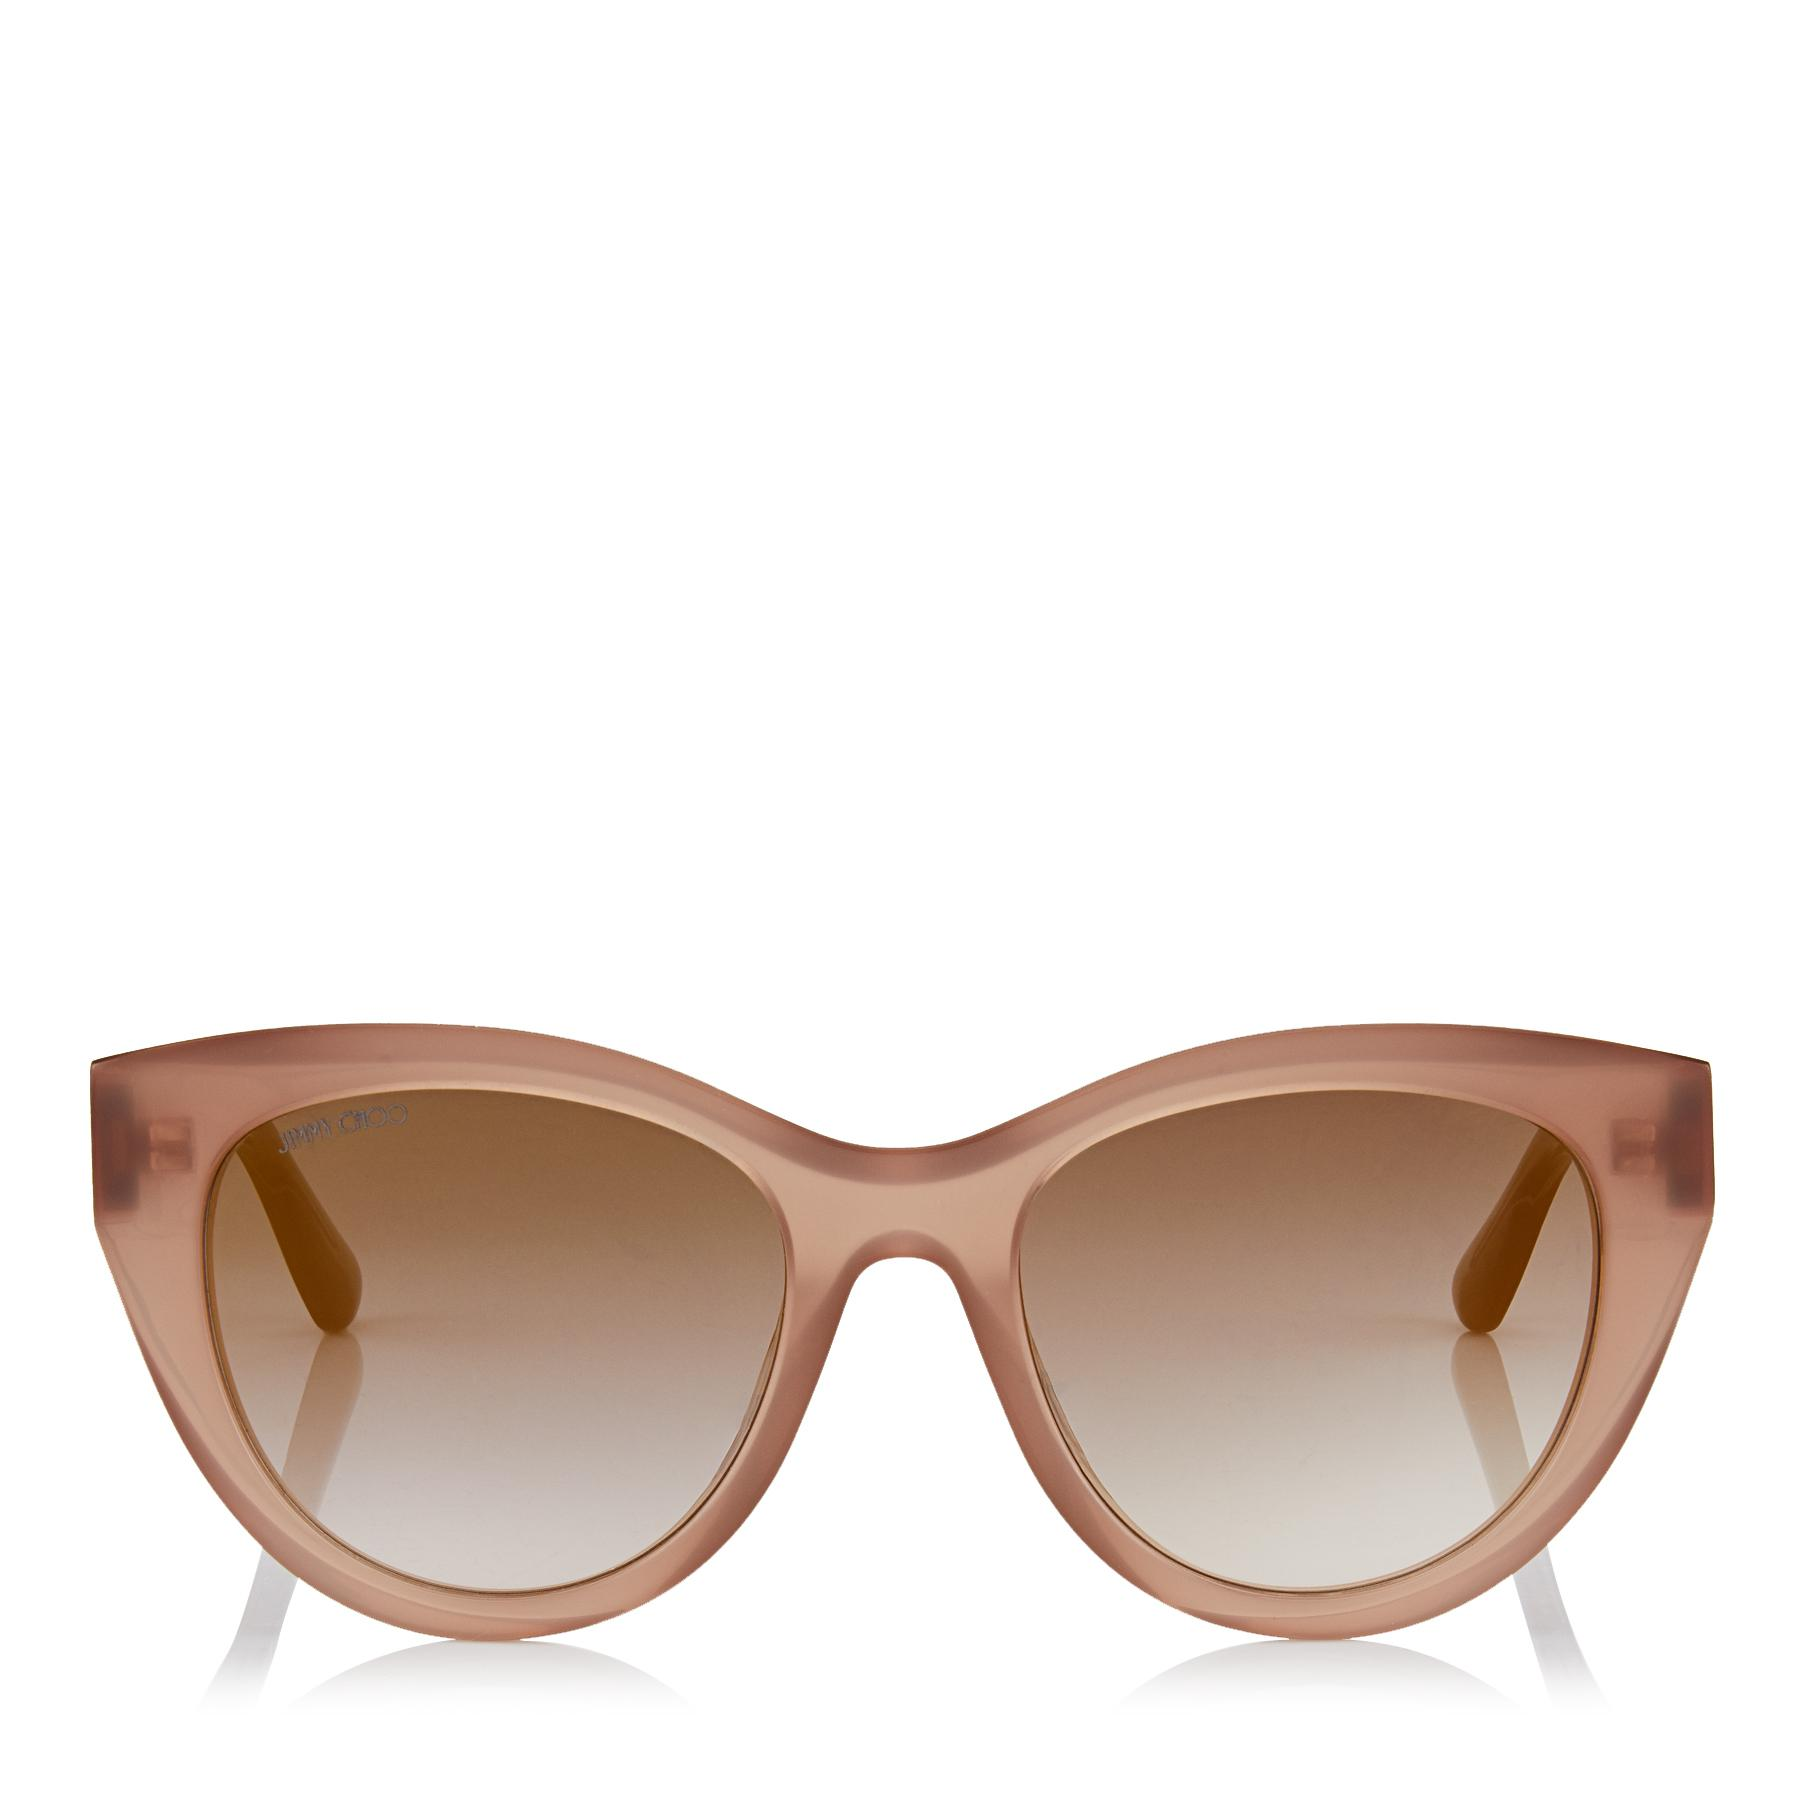 845c305588 Jimmy Choo. Women s Metallic Chana Opal Nude Cat-eye Sunglasses With Copper  Gold Chain Detailing